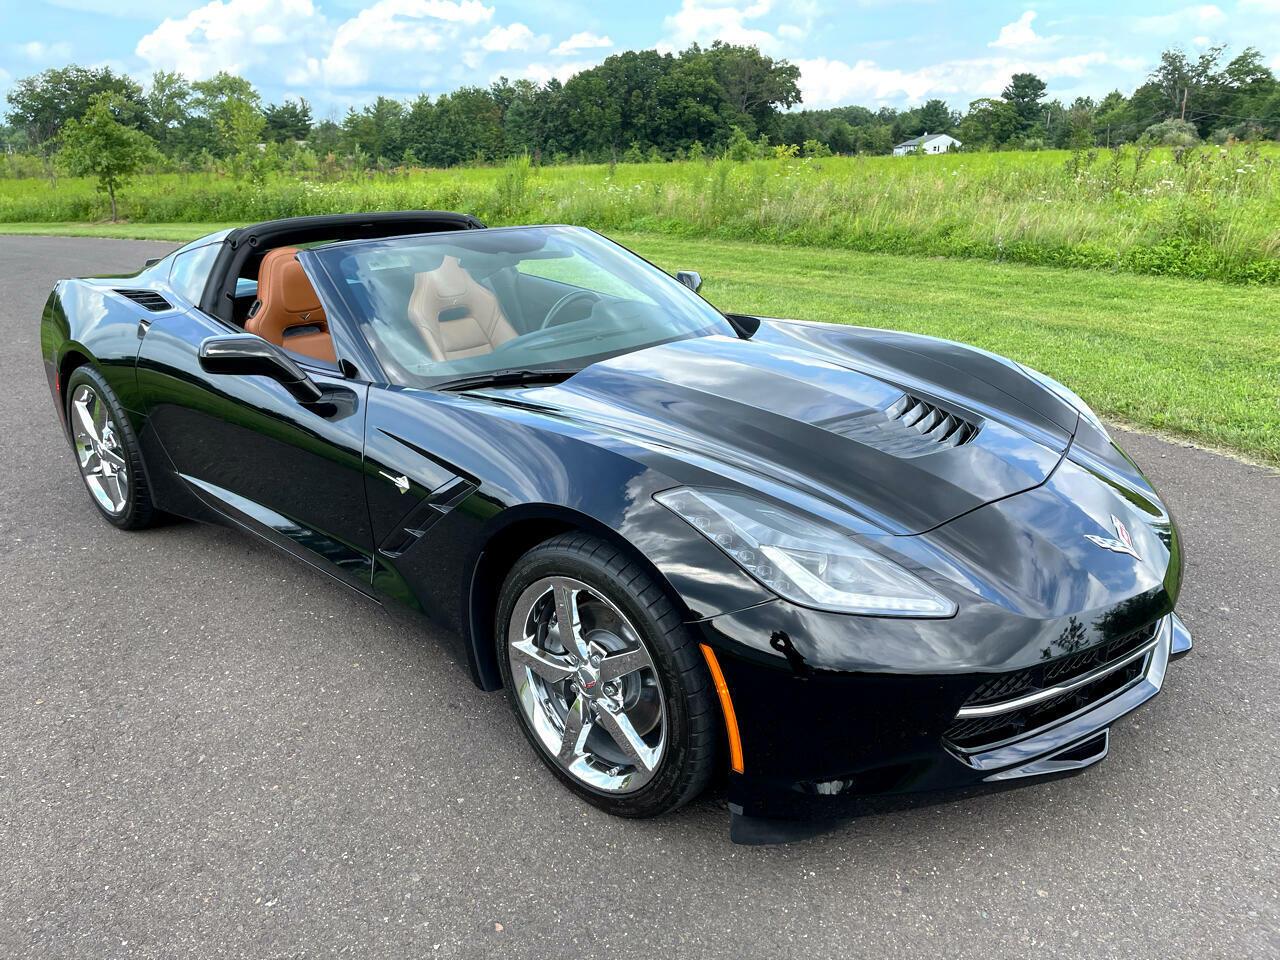 2014 Black Chevrolet Corvette Coupe 3LT | C7 Corvette Photo 3